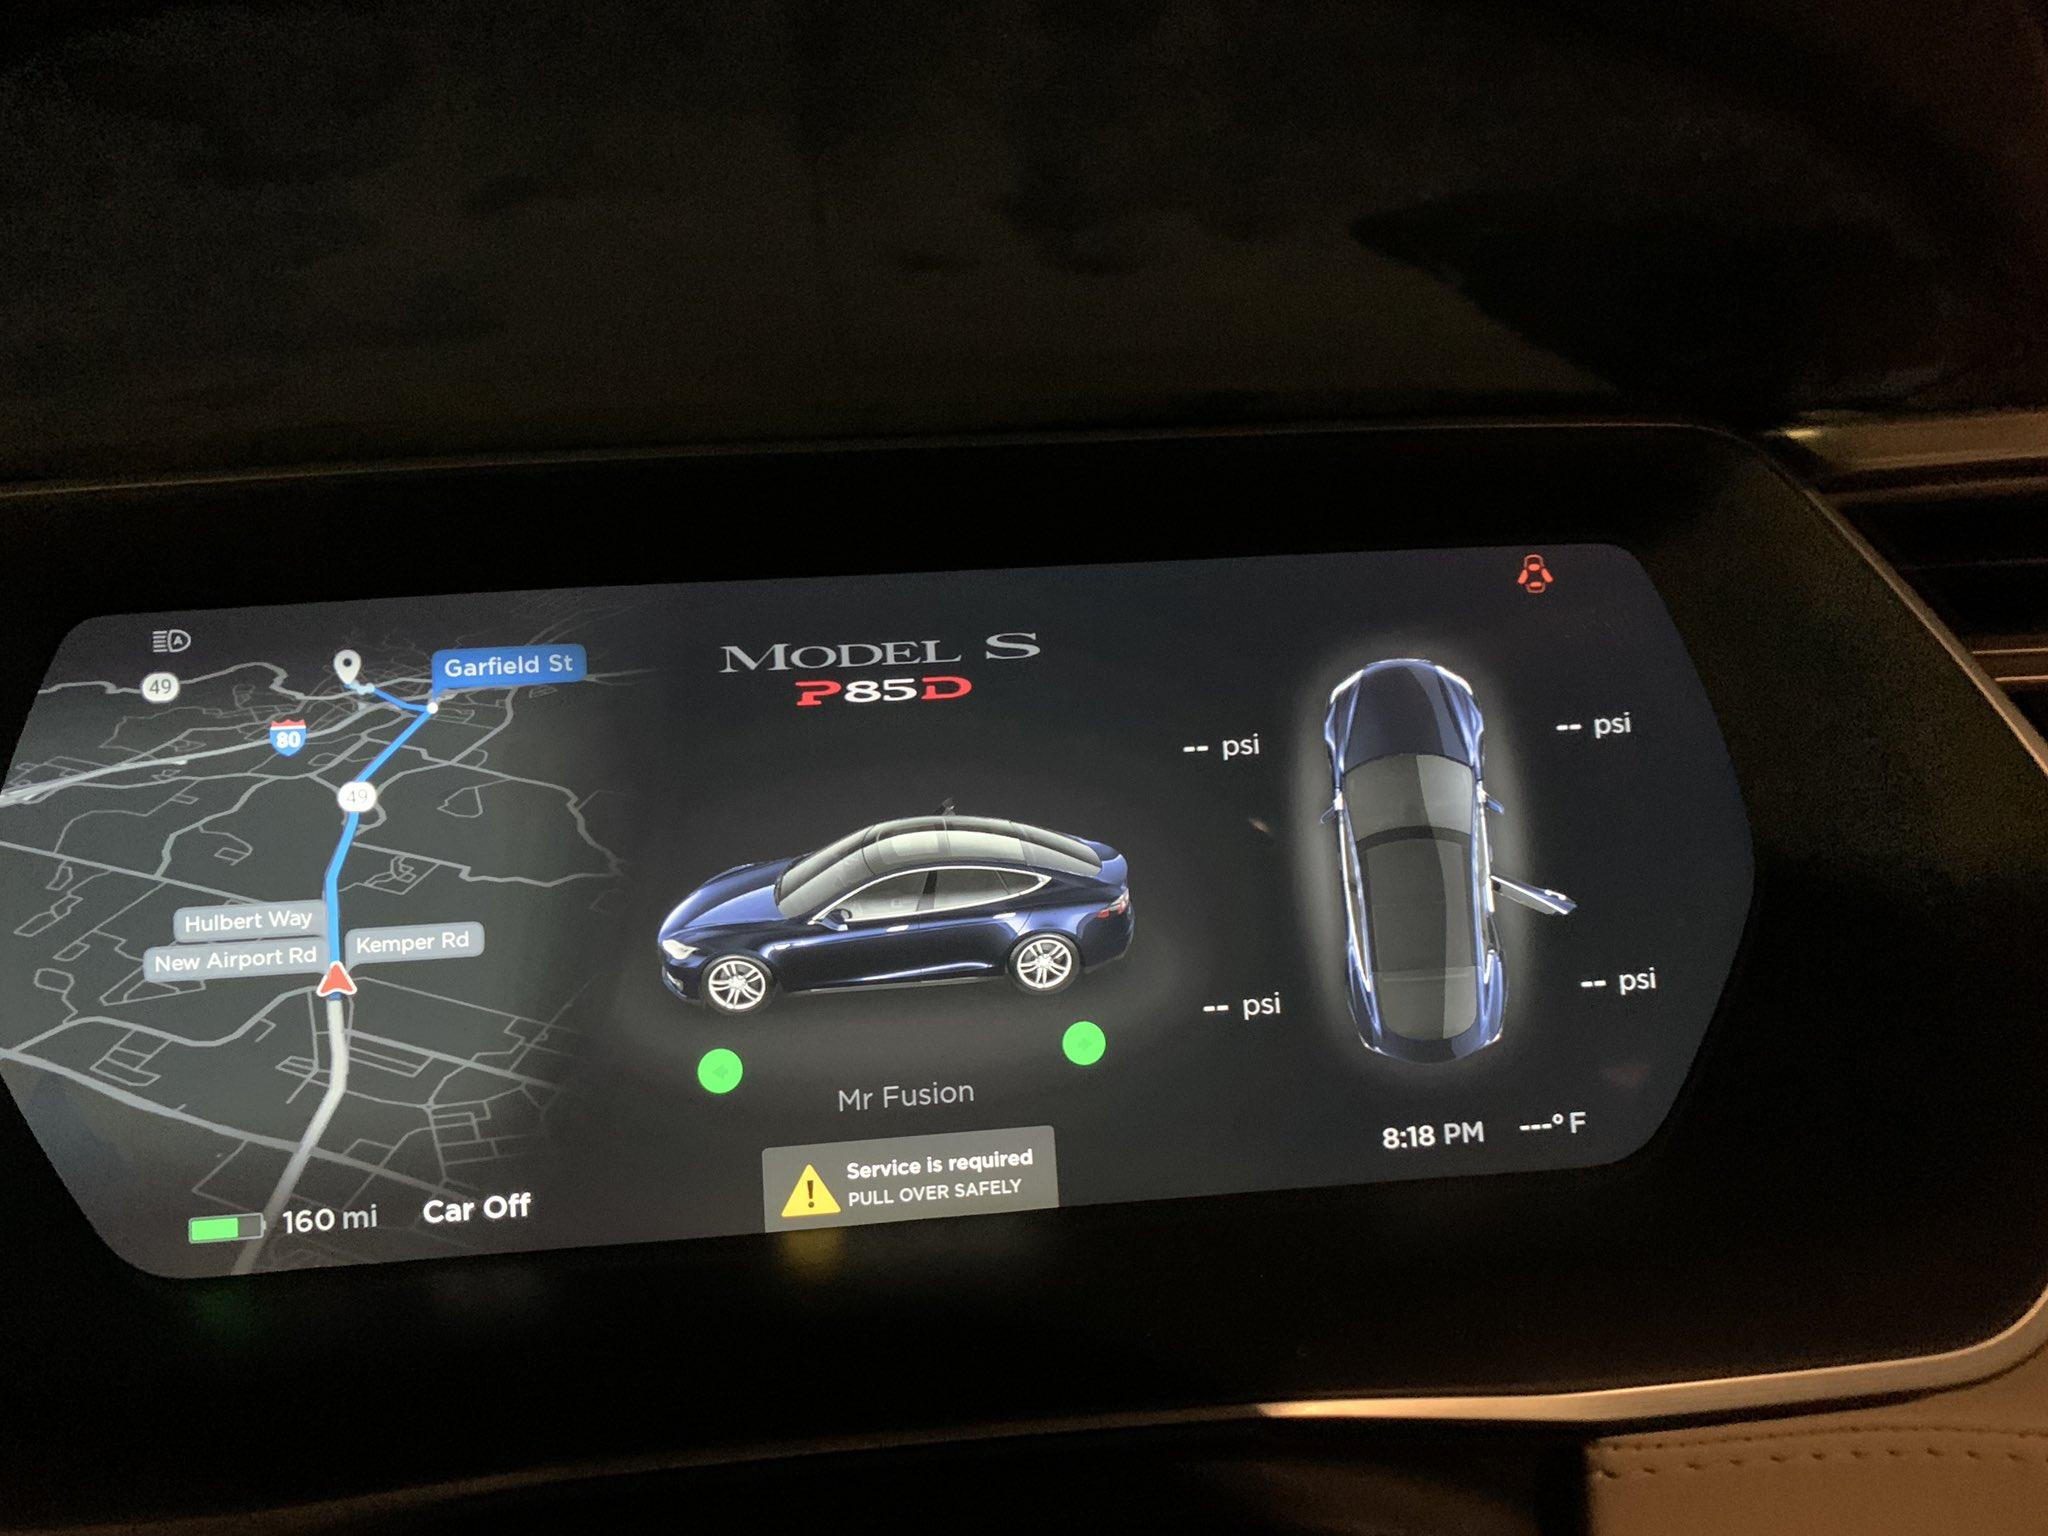 Tesla model S dashboard warning message